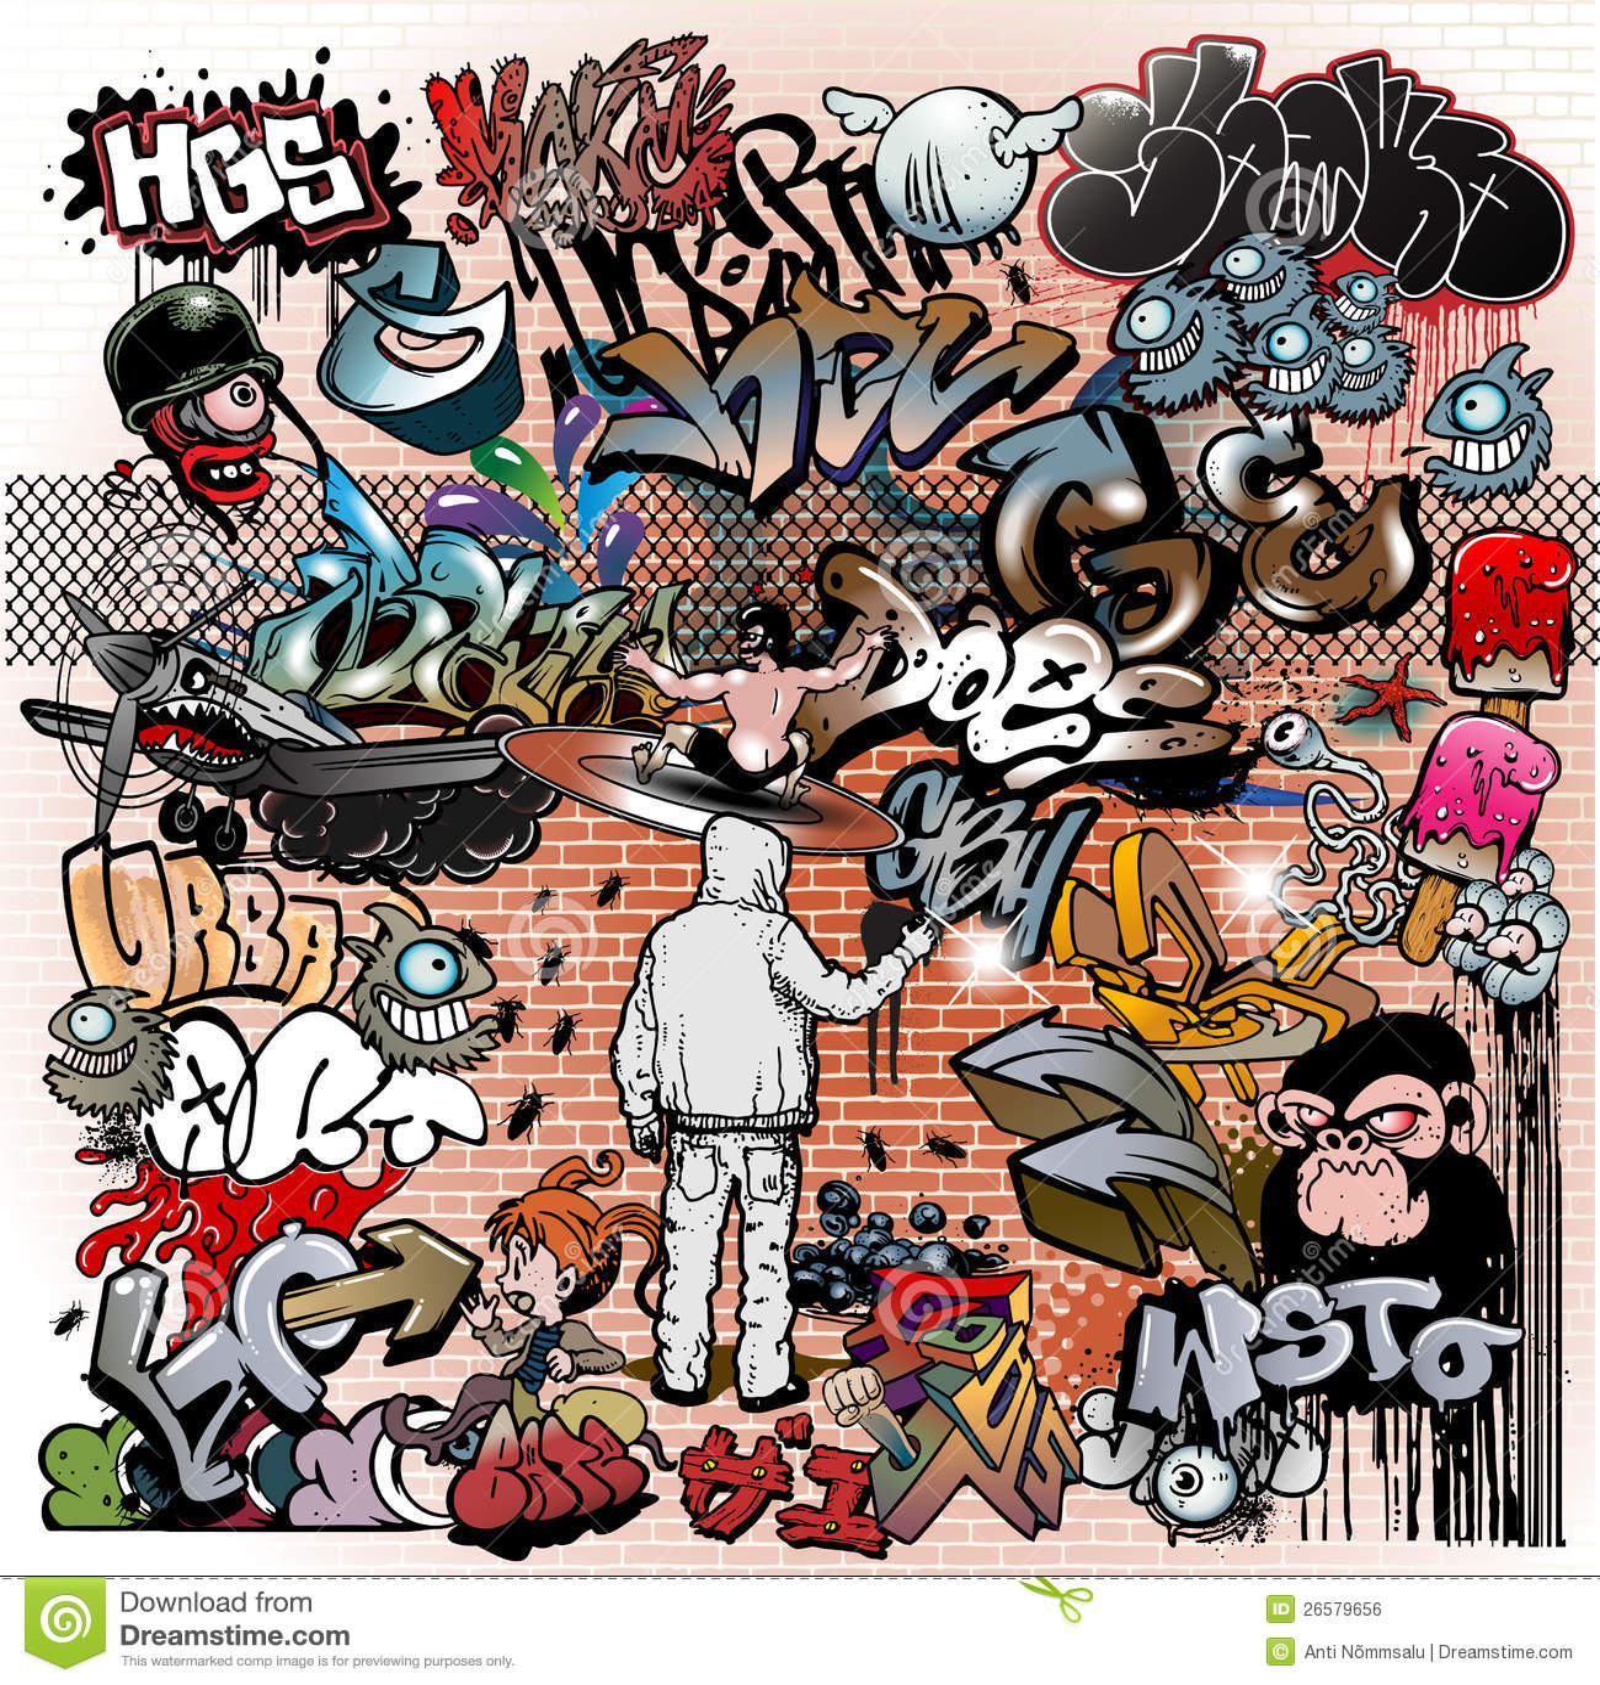 Elementi urbani di arte dei graffiti